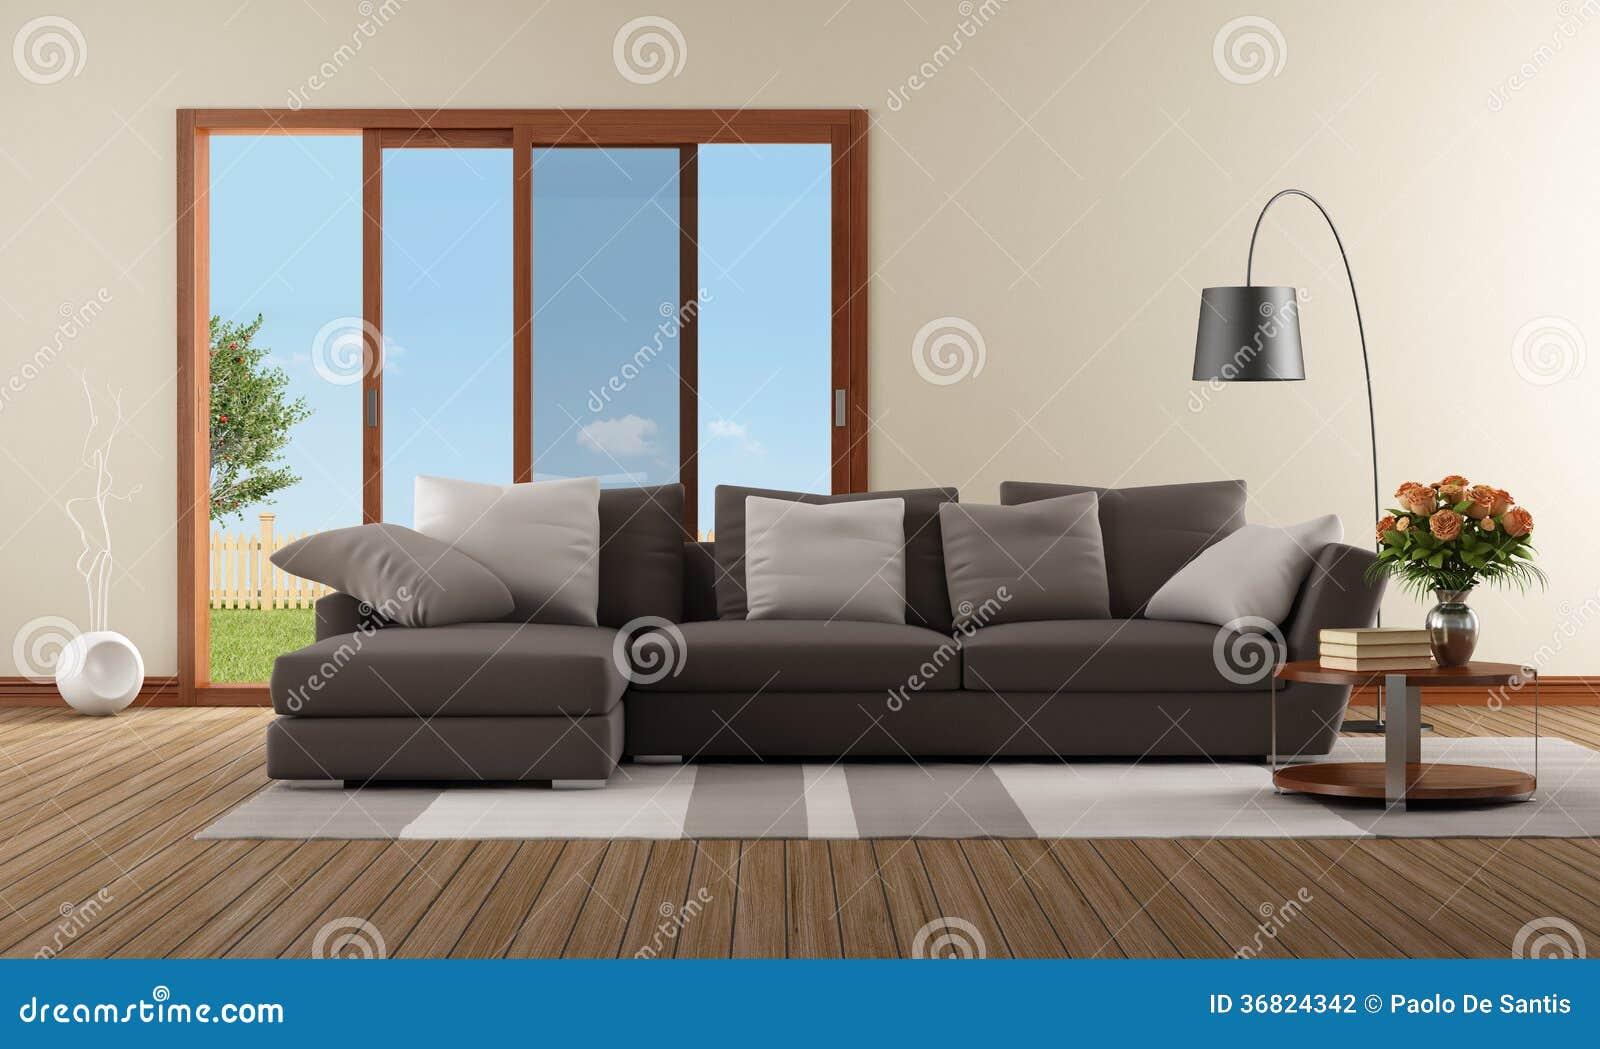 modern living room with brown sofa stock photography - image: 36824342